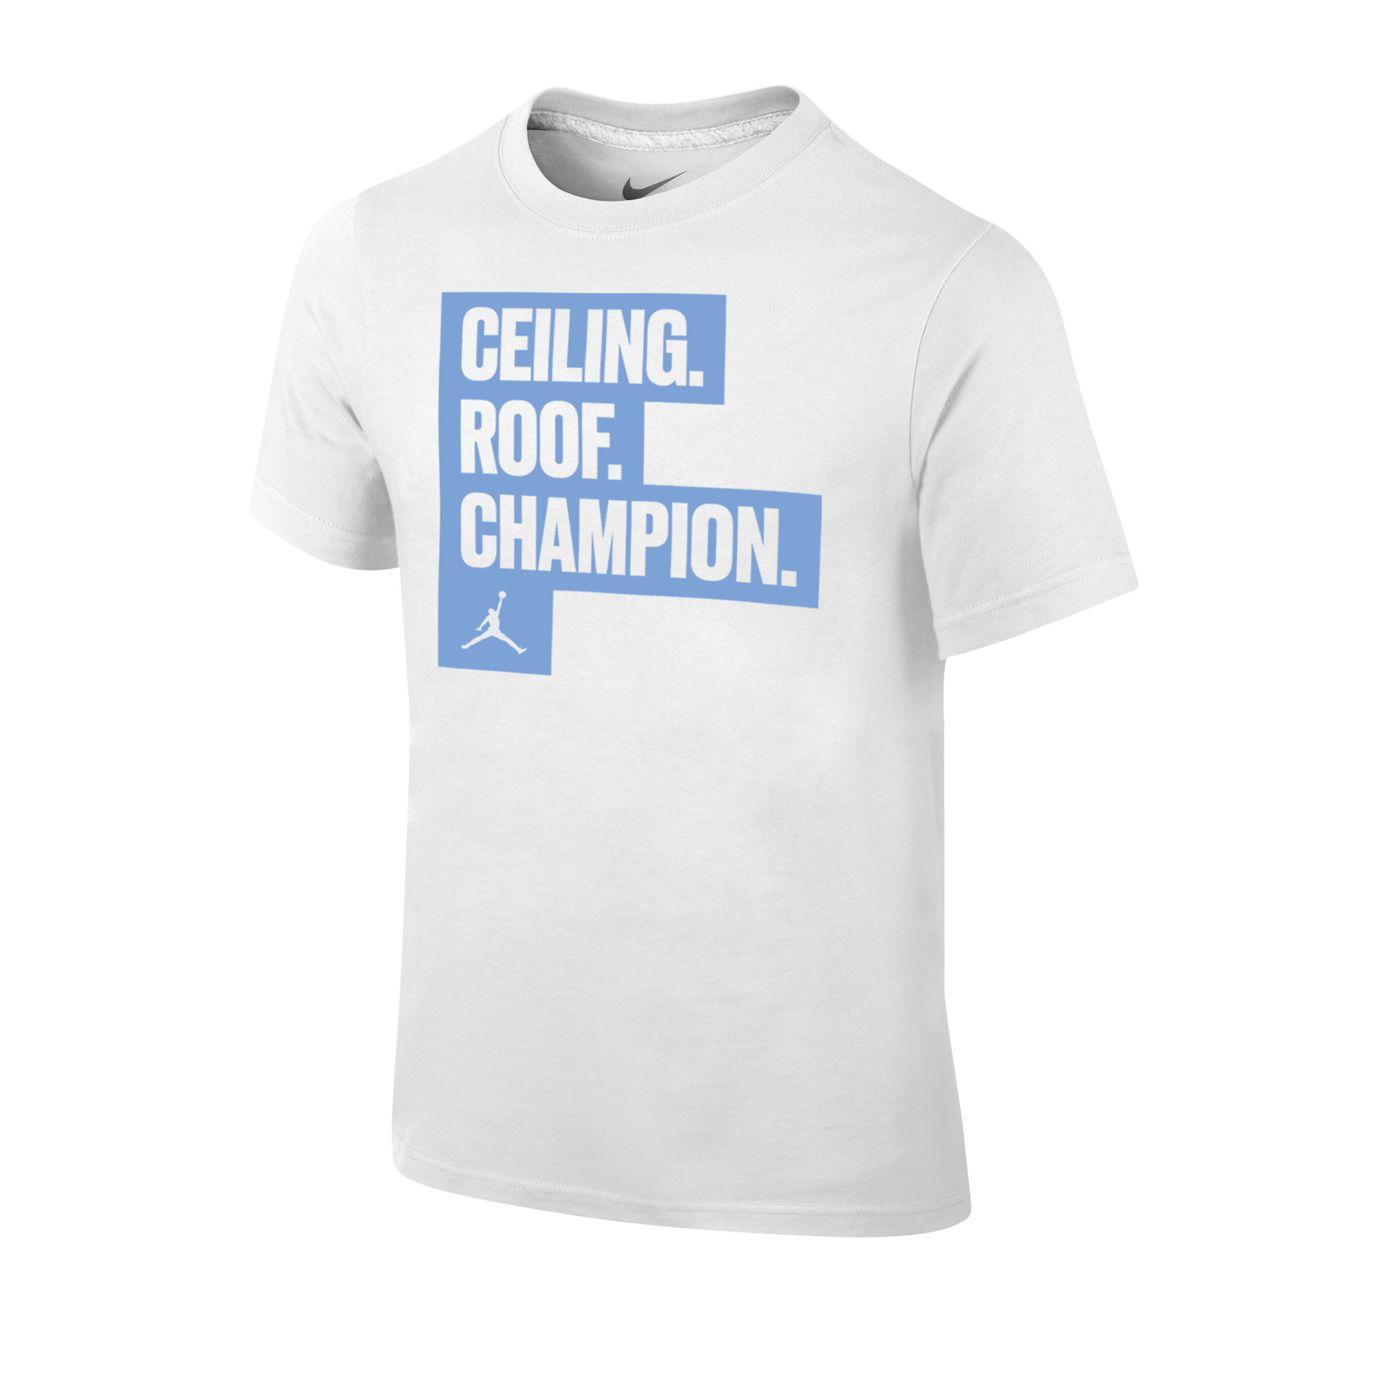 johnny t-shirt - north carolina tar heels - youth ceiling roof